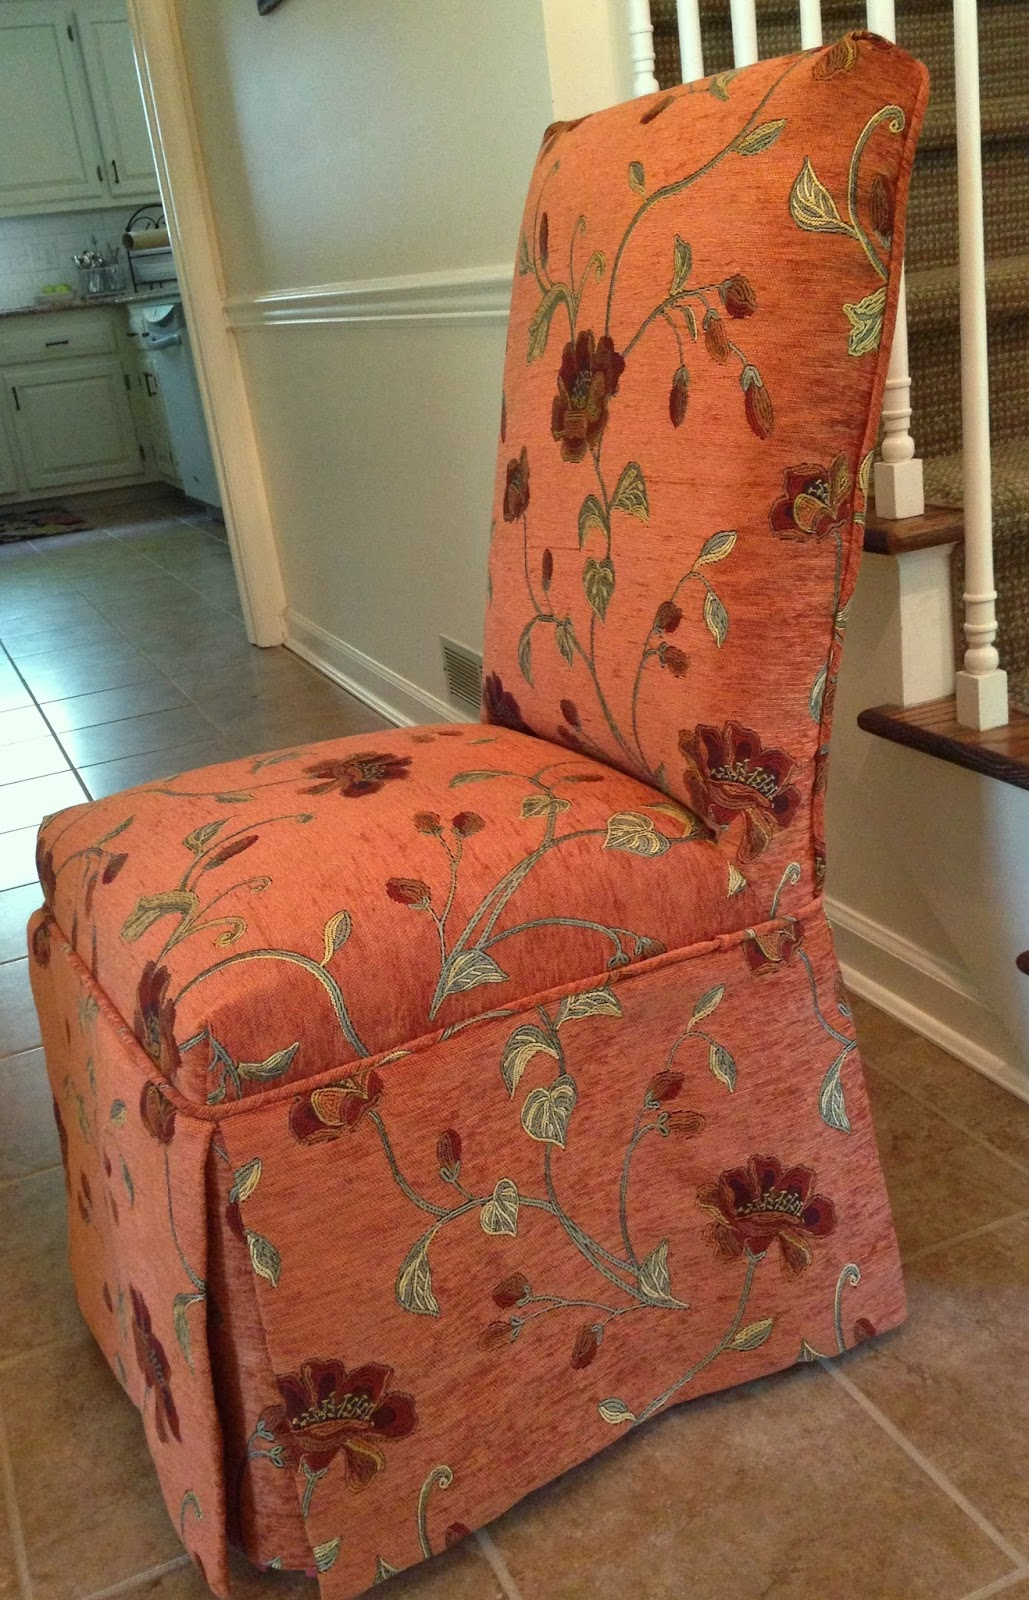 burlap dining chair covers wedding berkshire pam morris sews slipcovers